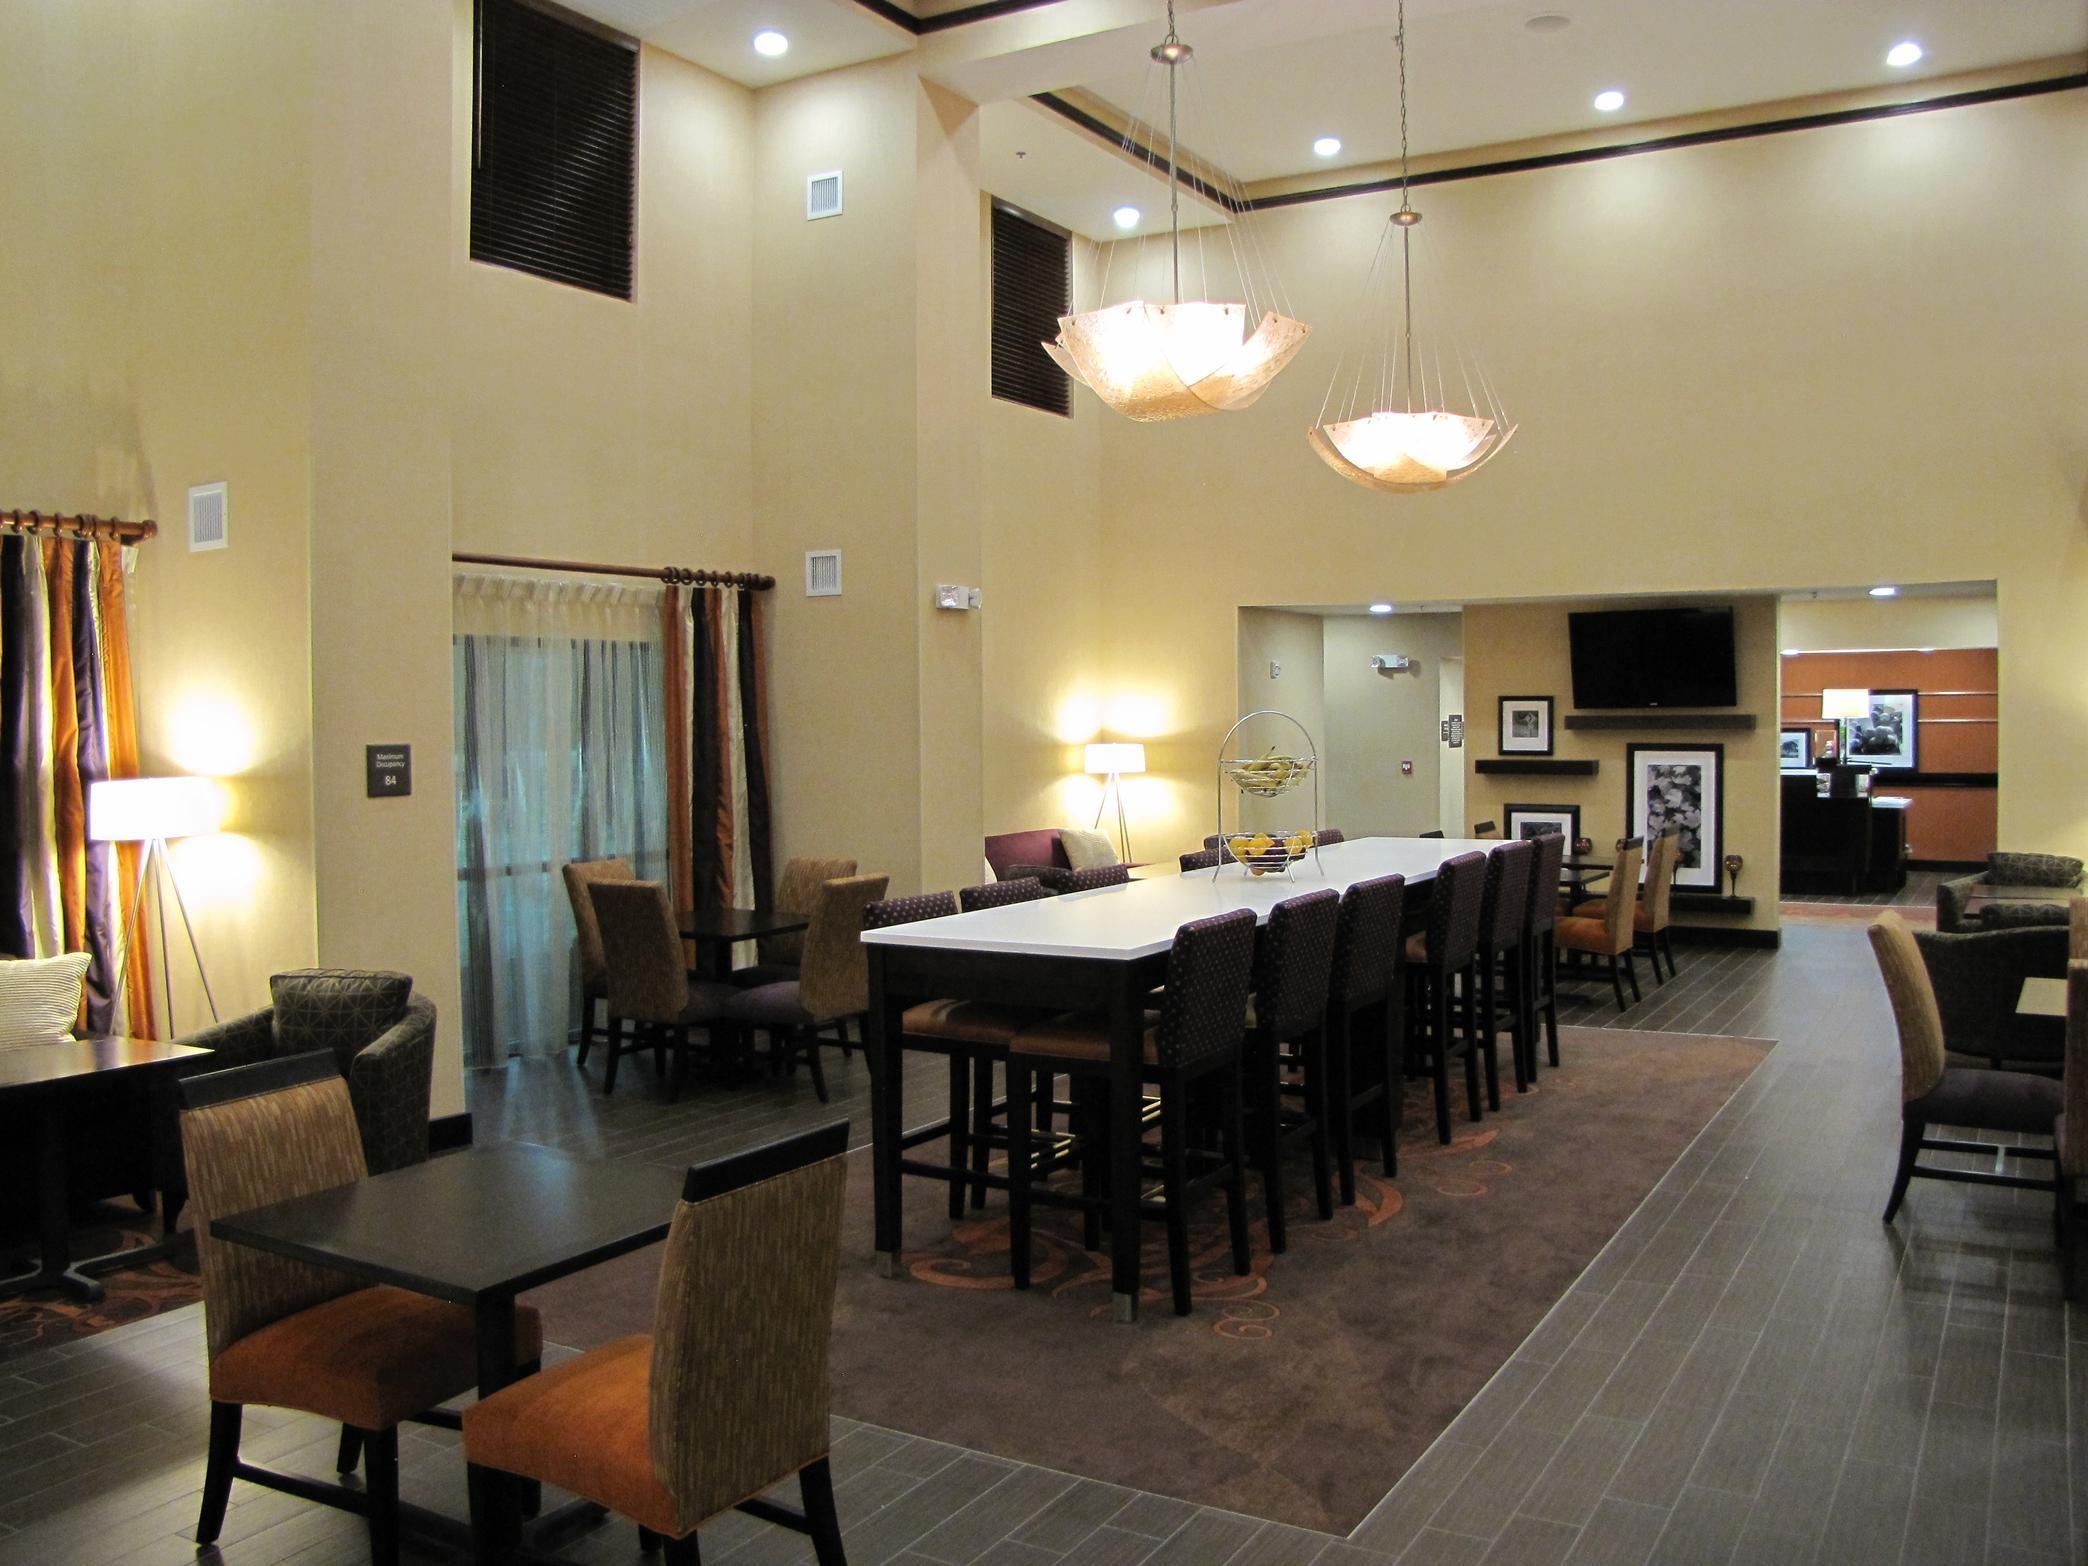 Hampton Inn & Suites Jamestown, ND image 1